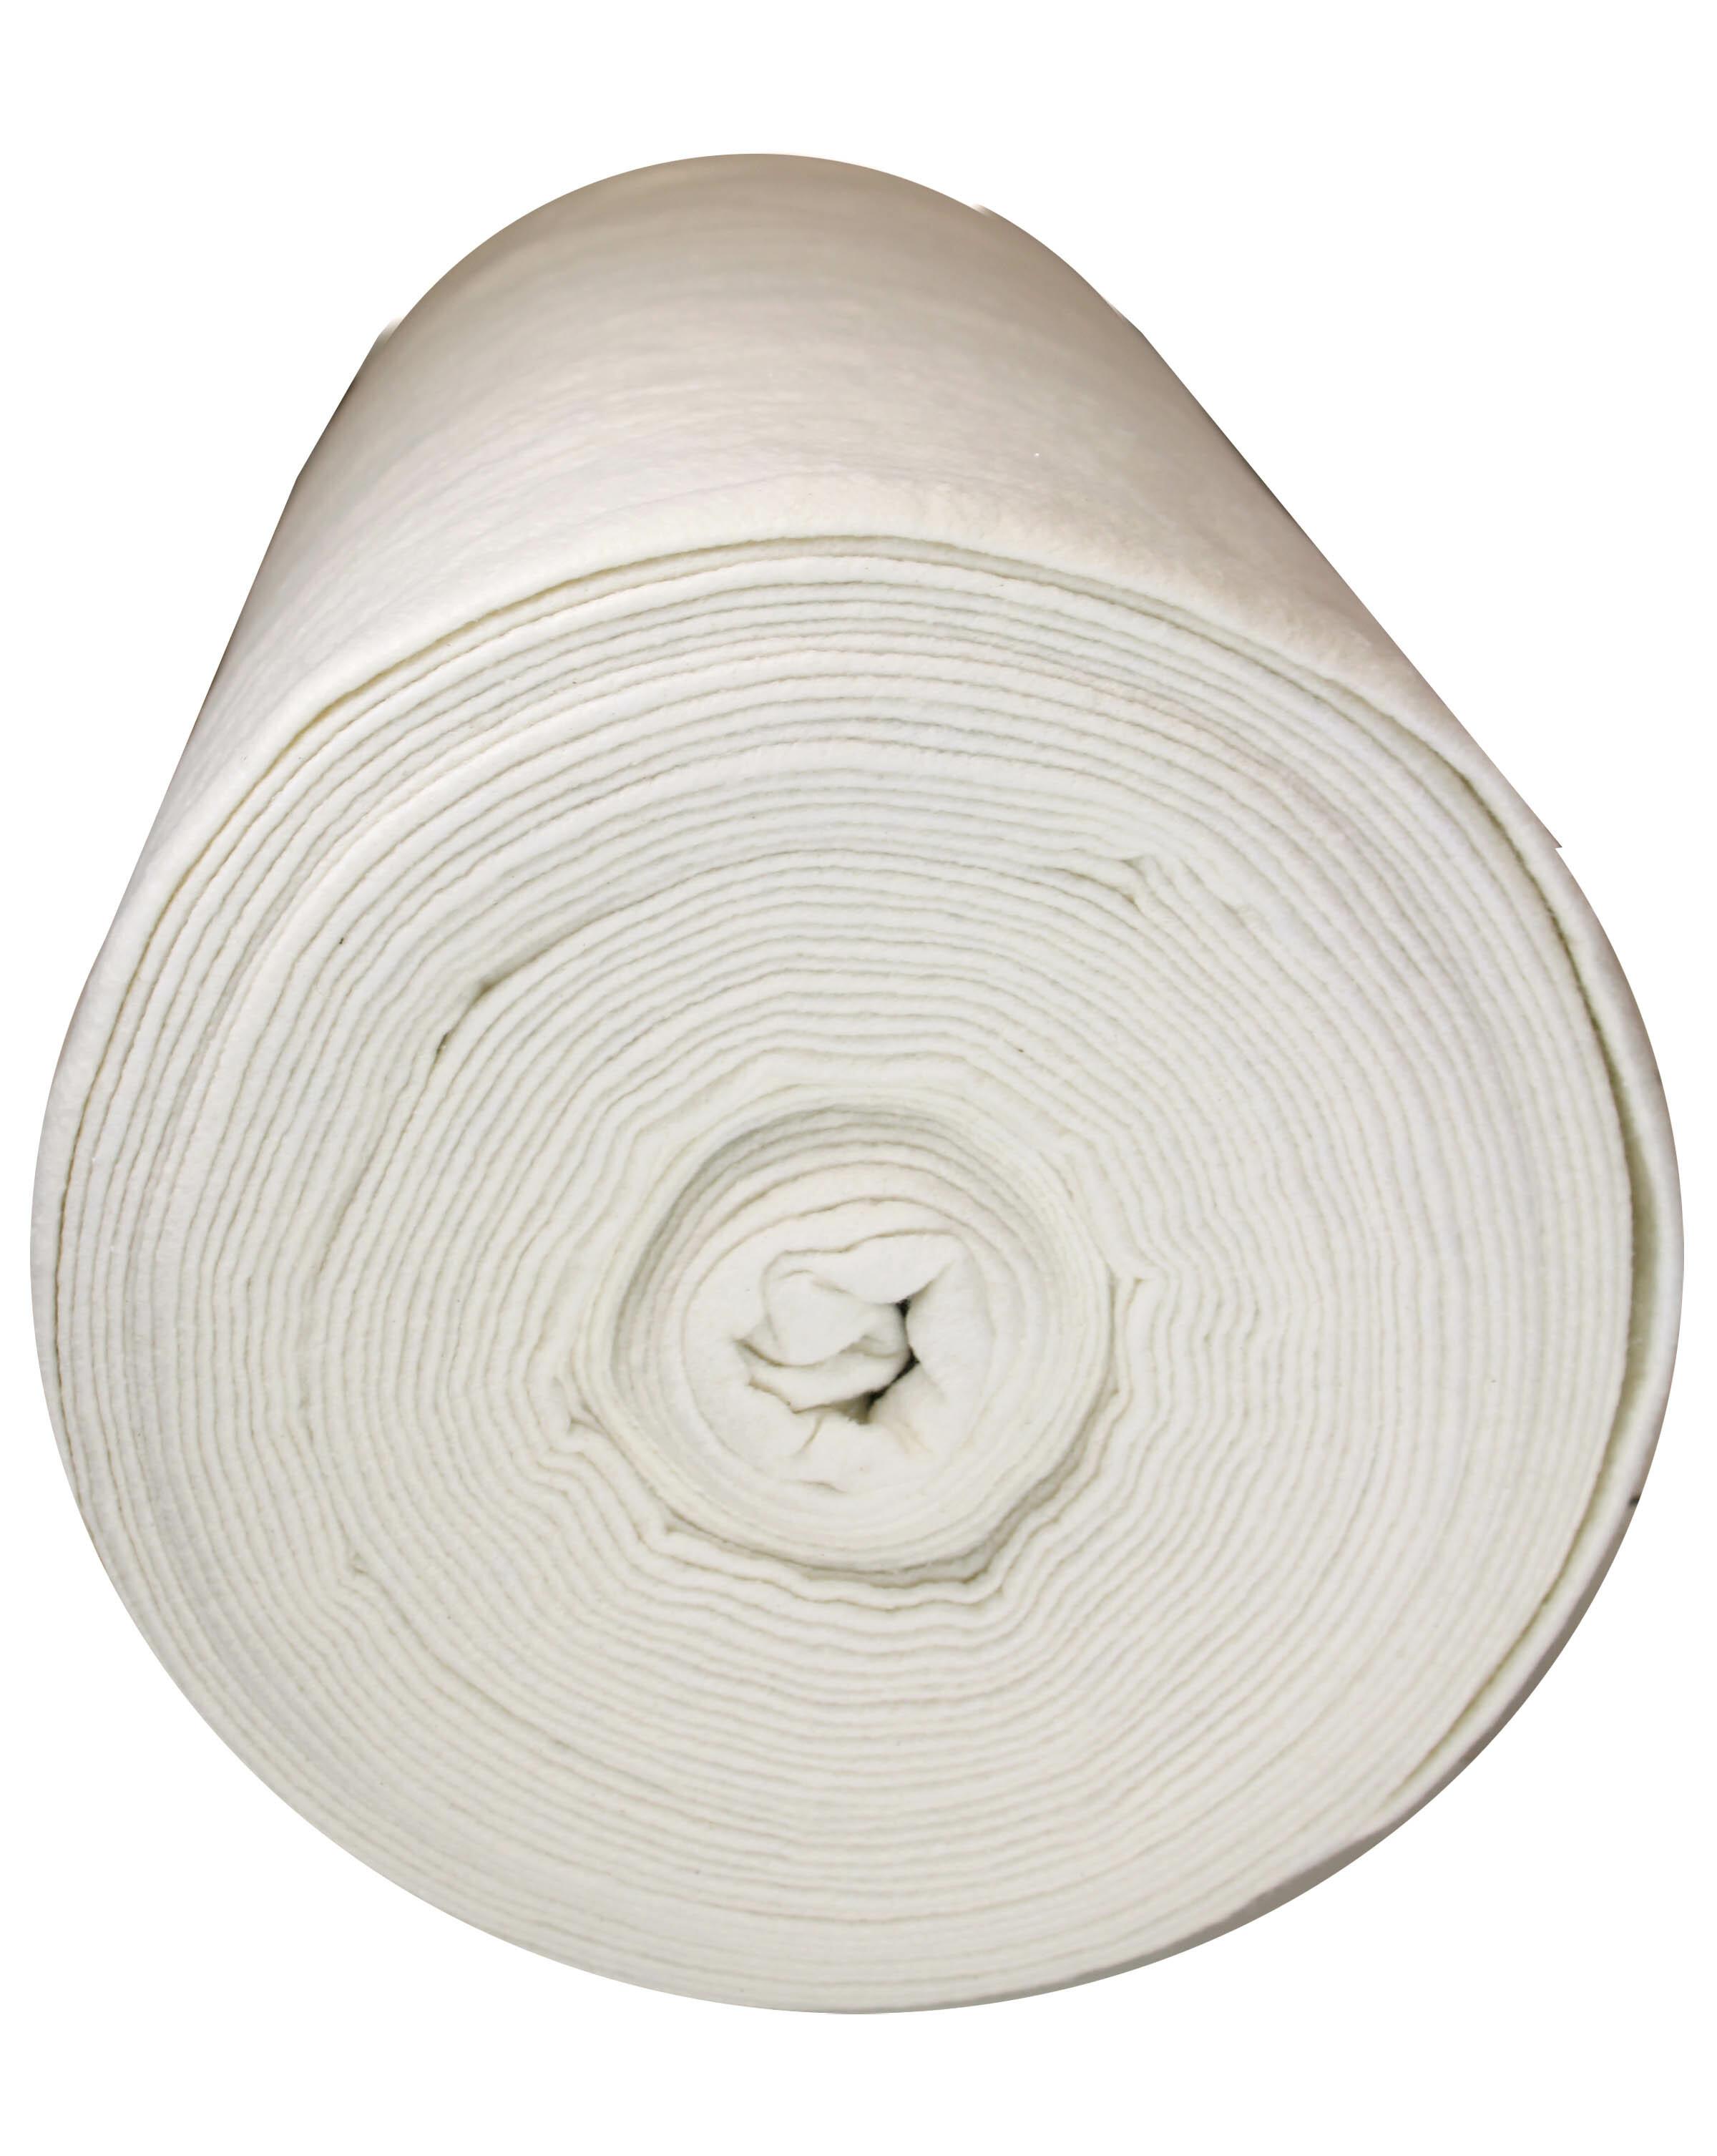 "100% Cotton Batting - 96"" wide - 1/2m cut 9C8SMEW1"